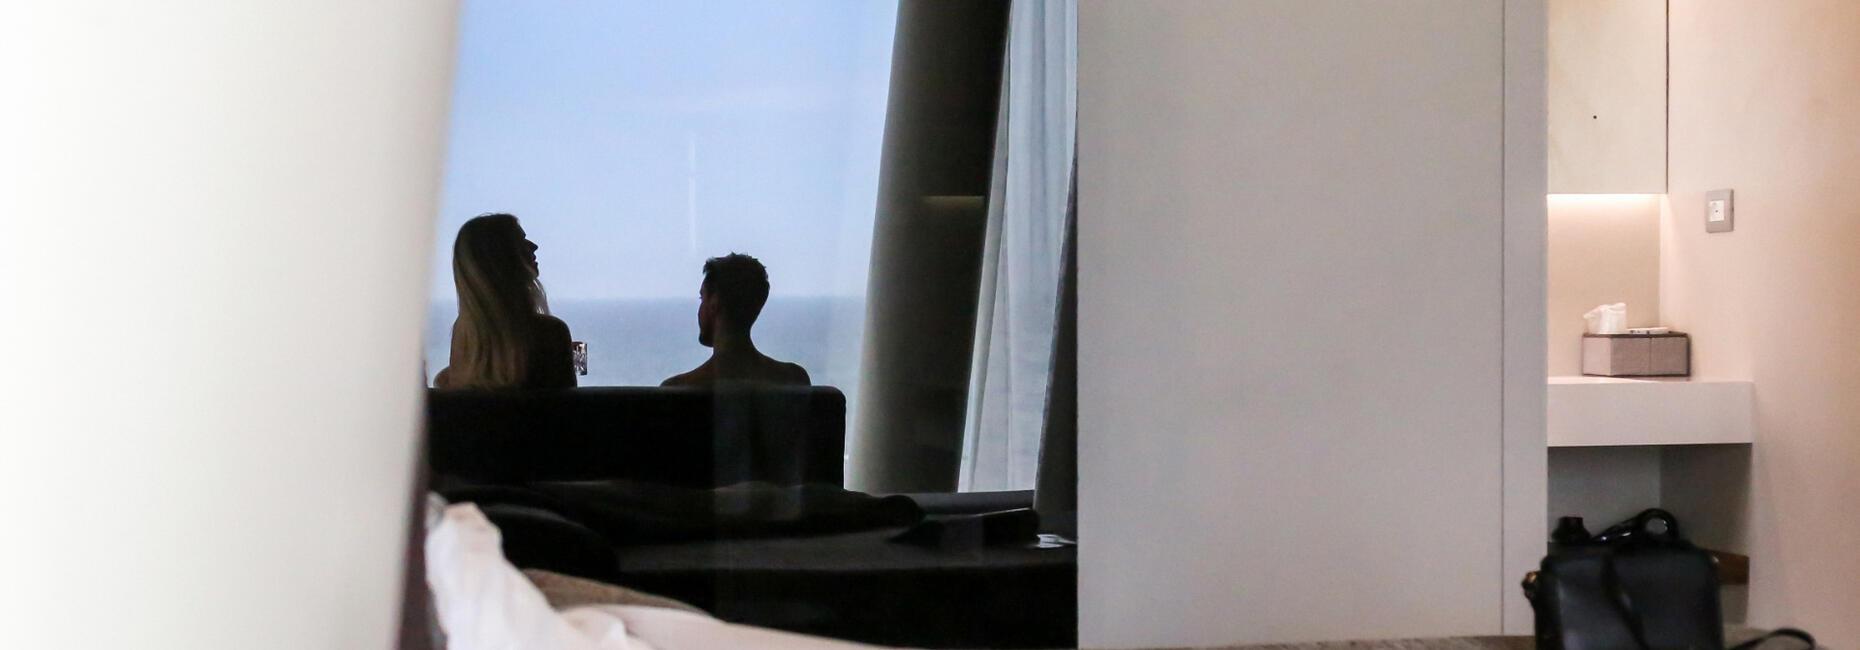 hotelcommodore fr suites-vue-mer-cervia 012